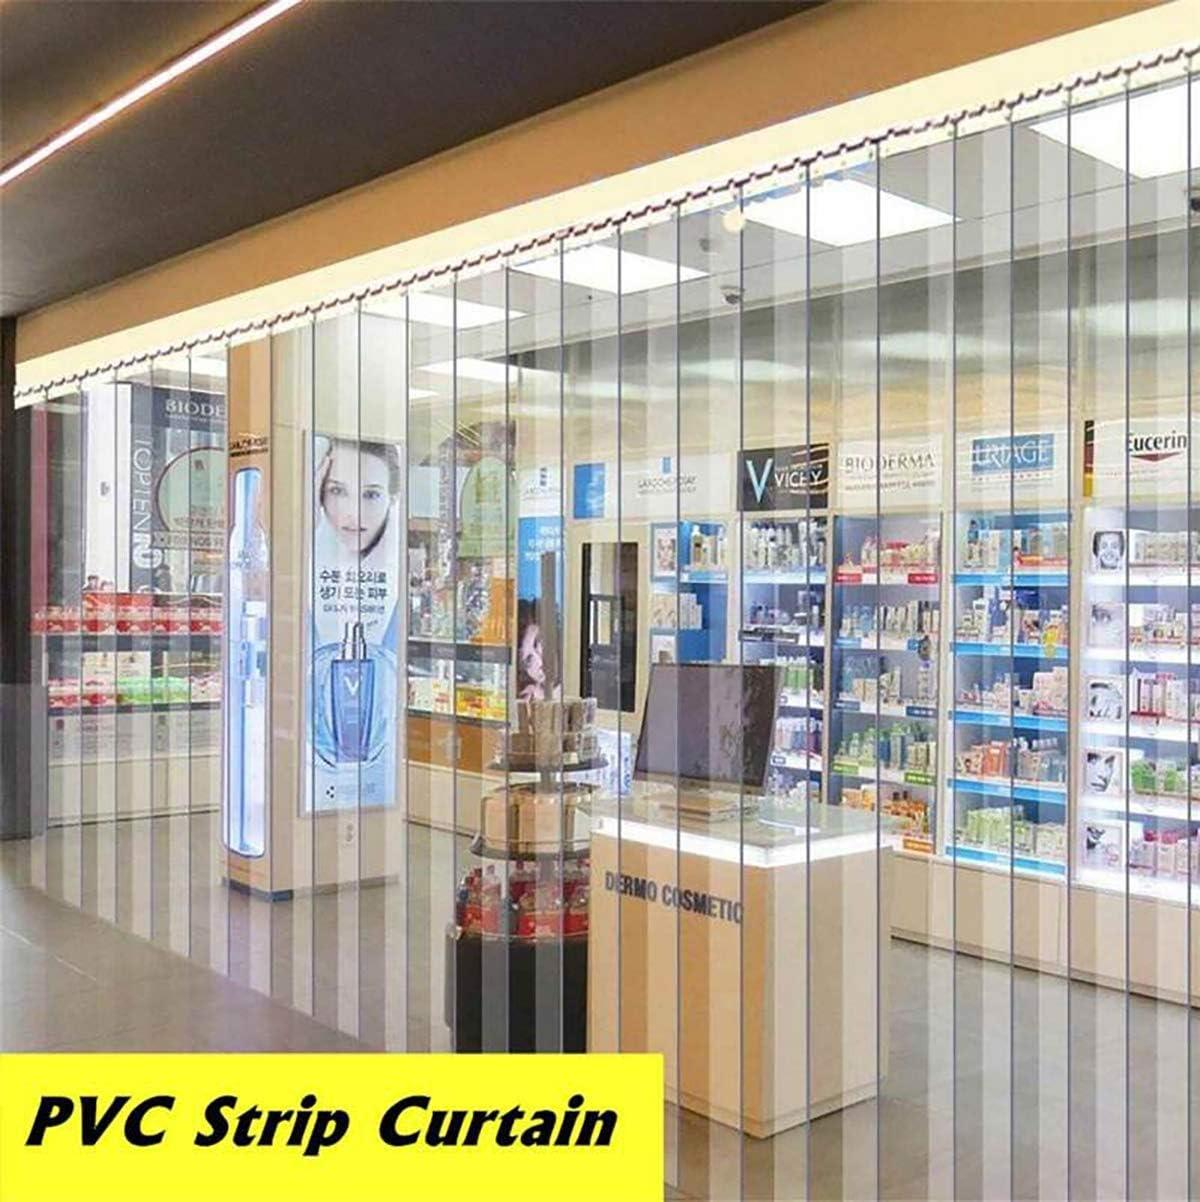 Liziyu PVC Plastic Strip Door Curtain Kits Hardware Included for Freezer Doors Warehouse Doors Anti-Horse-Fly, Wind Resistance, Heat-Resisting Transparent Soft Strip Curtain,3.2MM,90220cm(6pc)